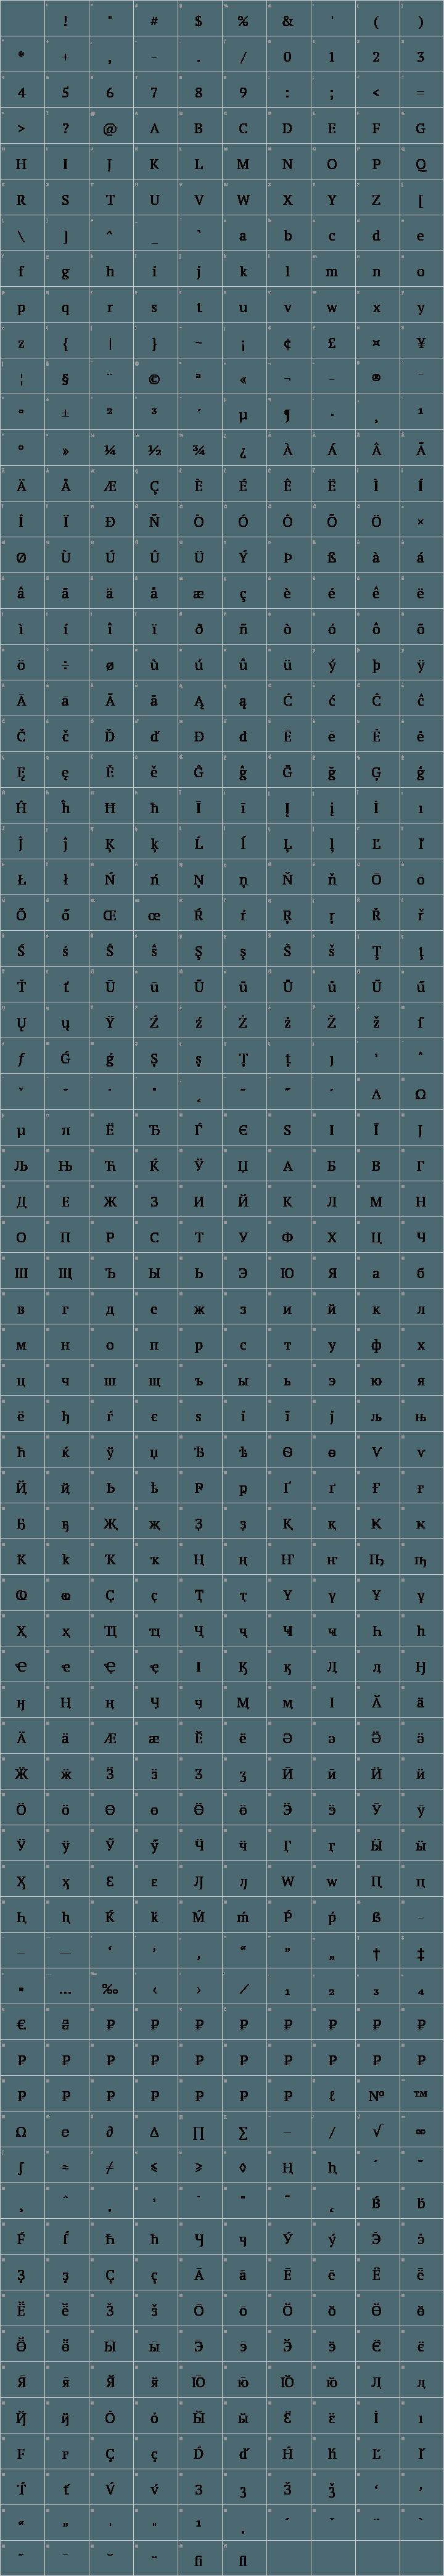 PT Serif Font Free by Paratype » Font Squirrel